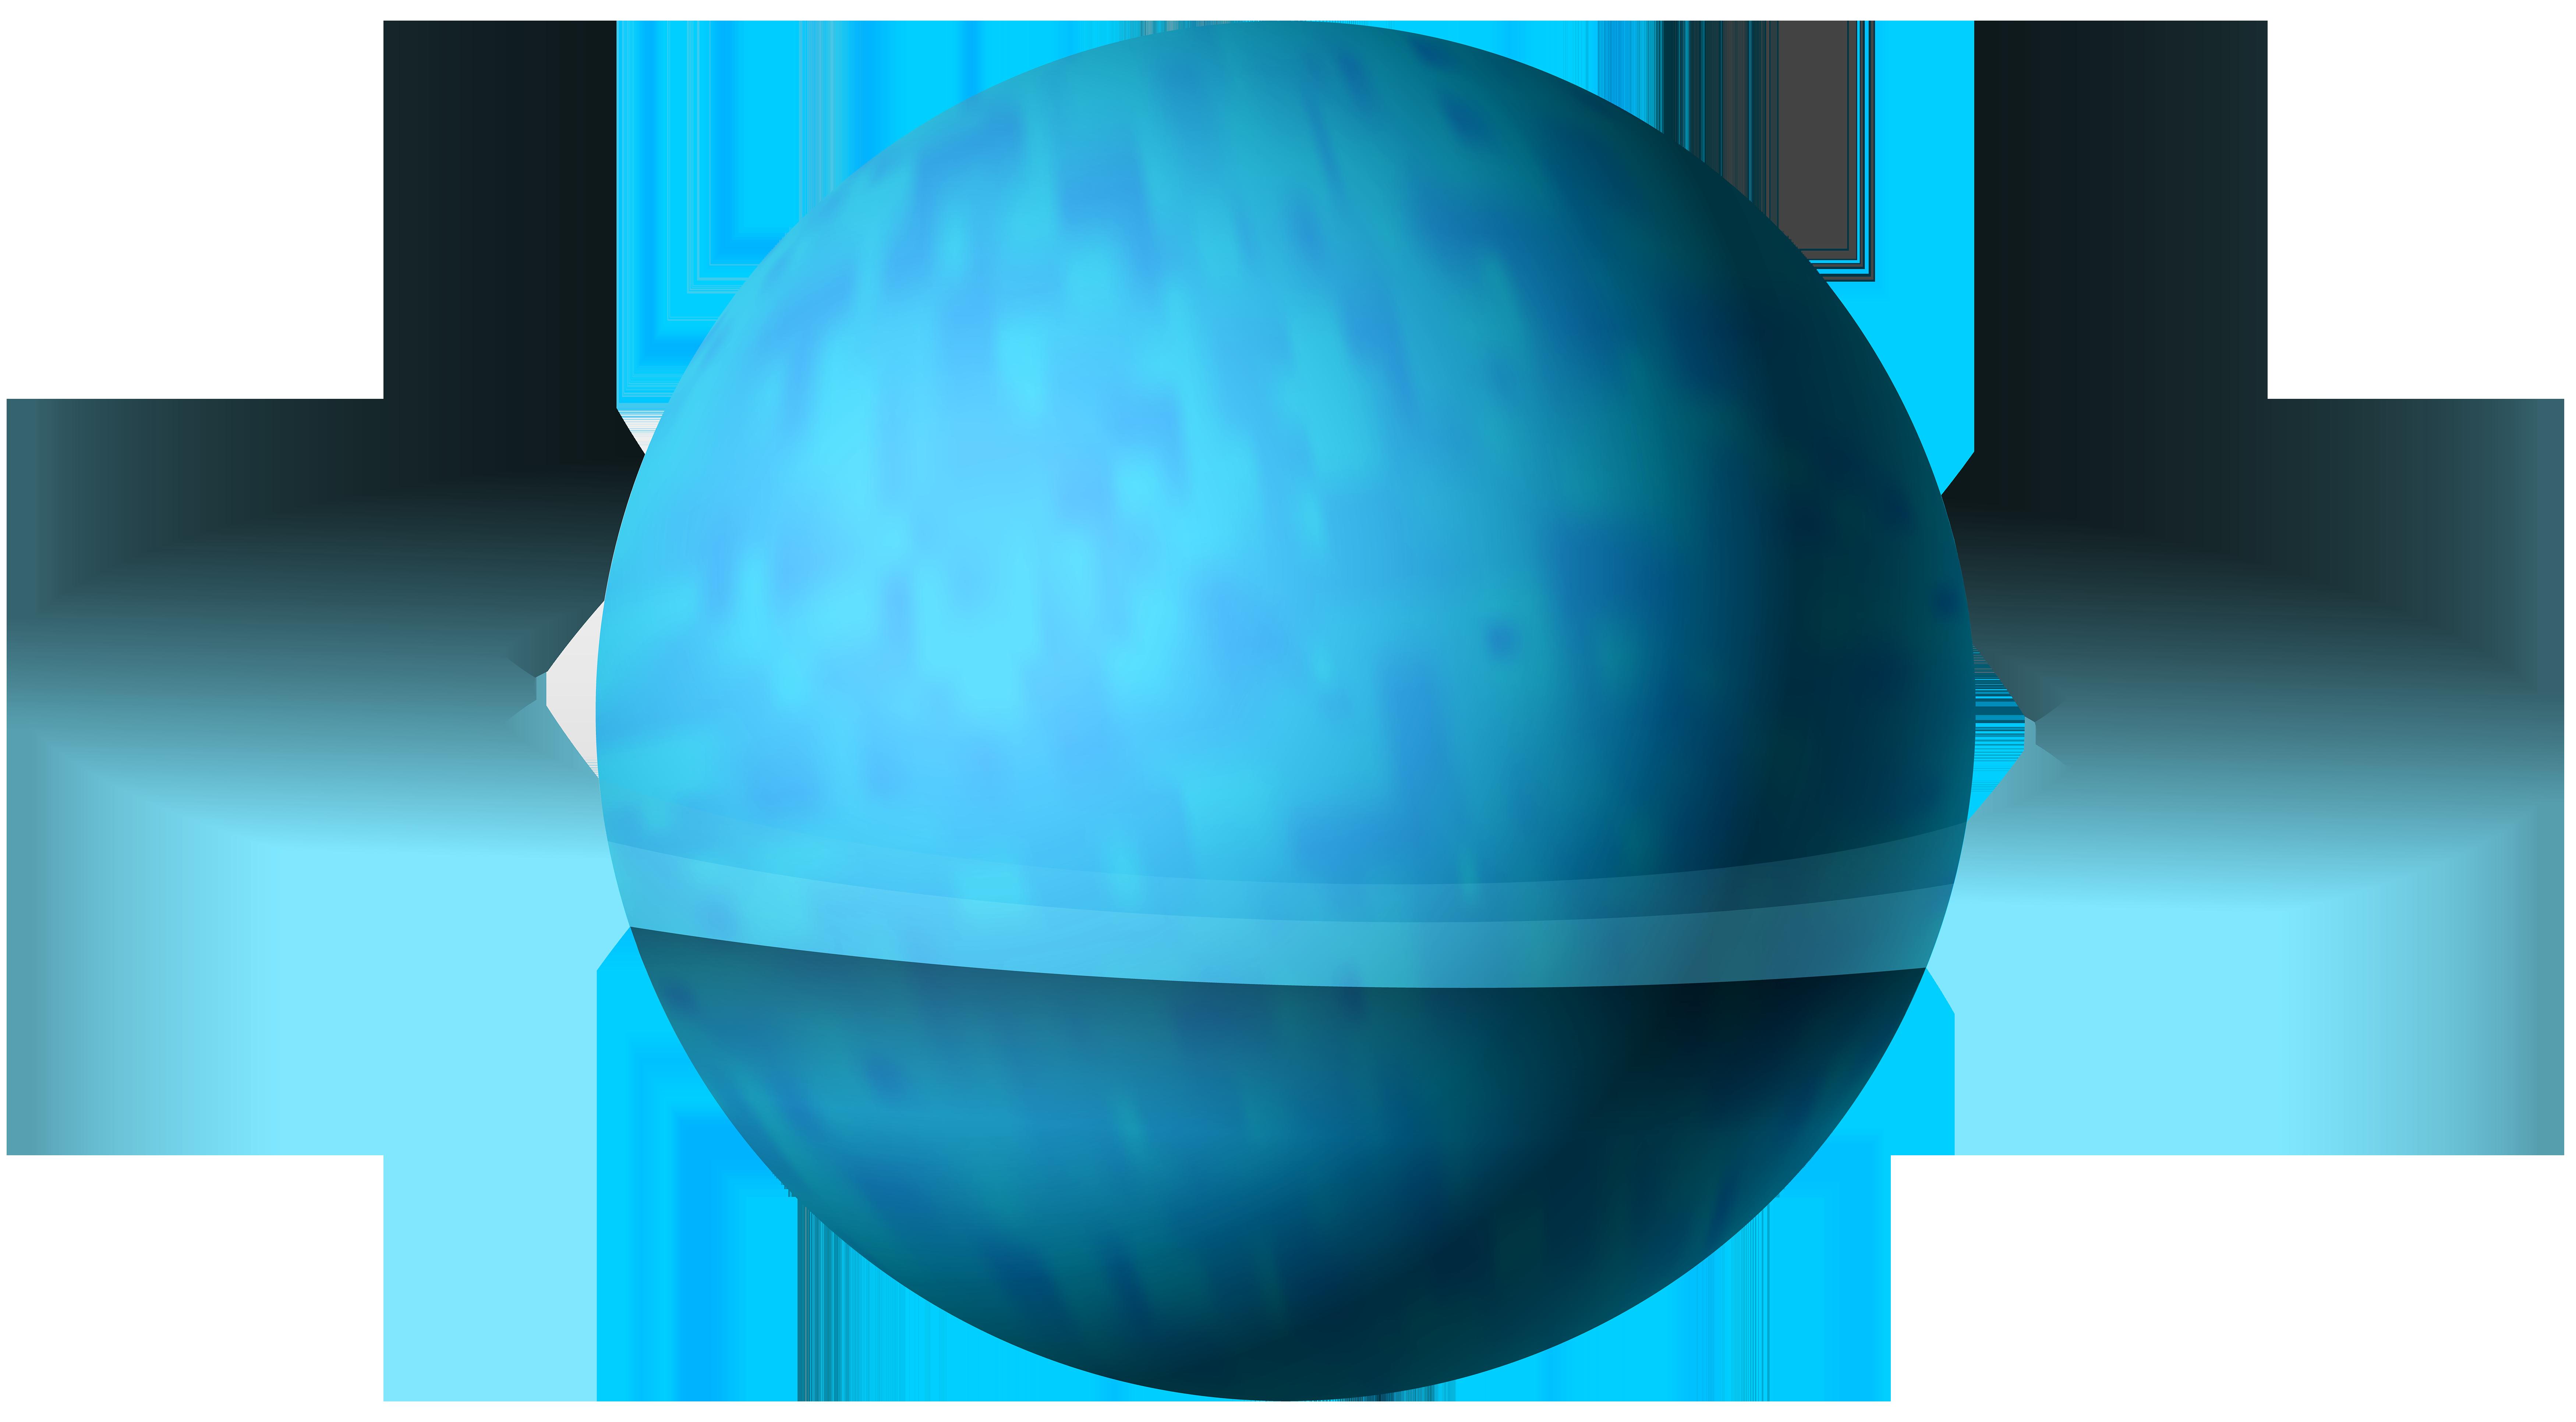 Planet clipart real planet. Uranus png clip art